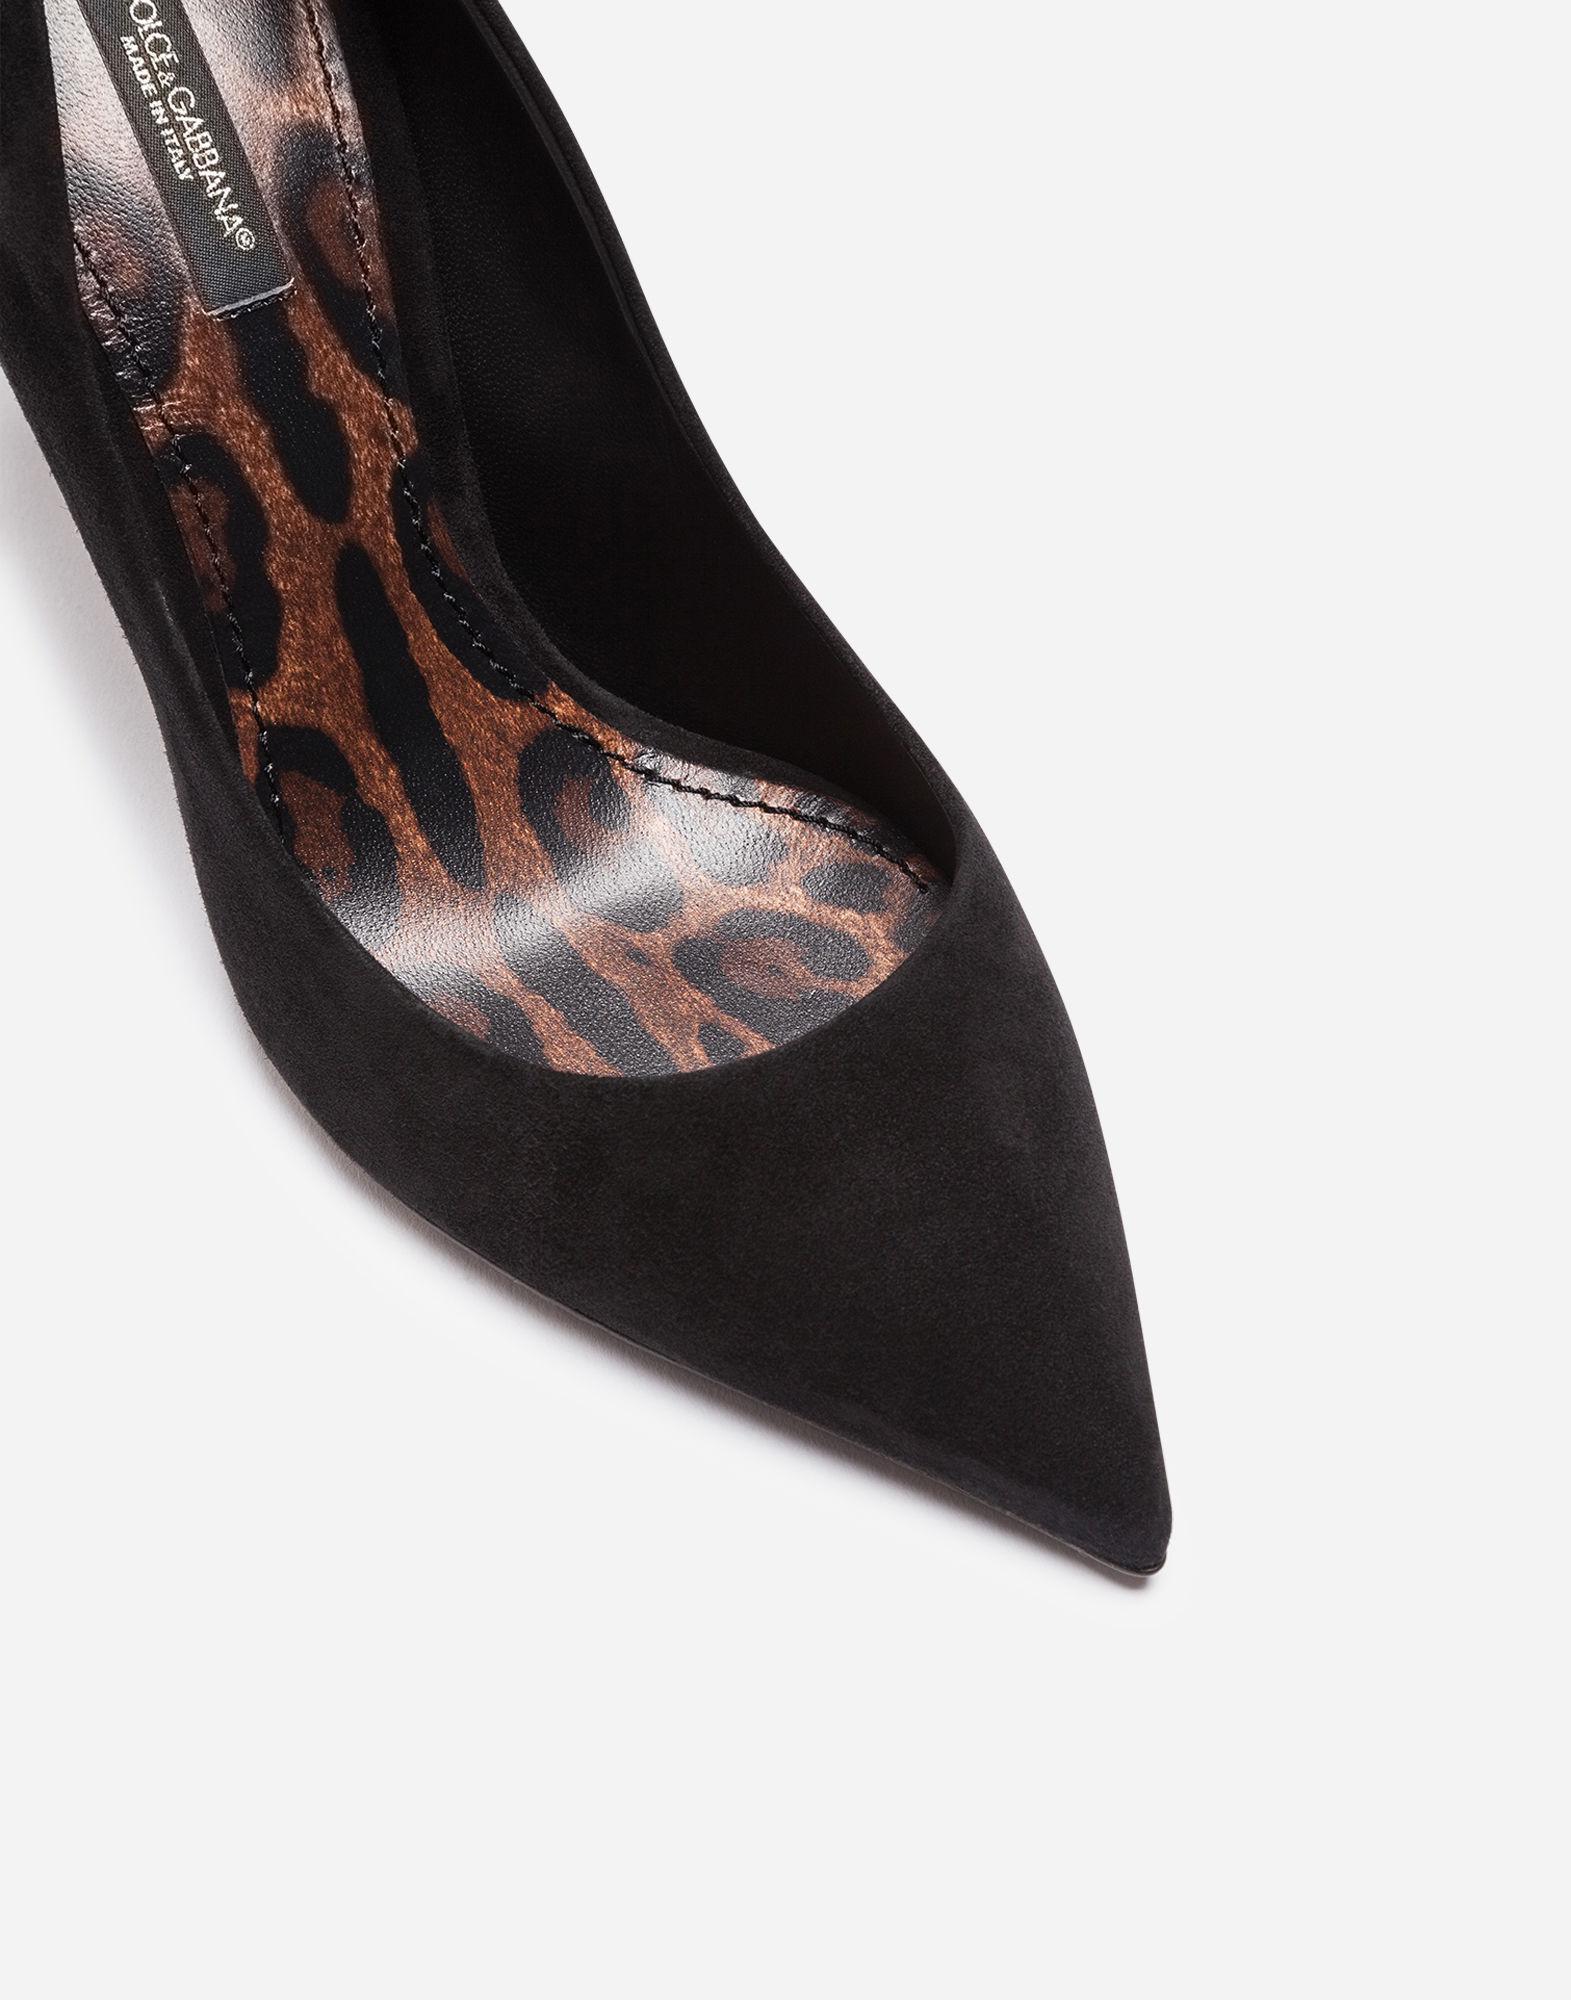 fd90f2b5286 Dolce & Gabbana Suede Pumps With A Leopard Print Sole in Black - Lyst